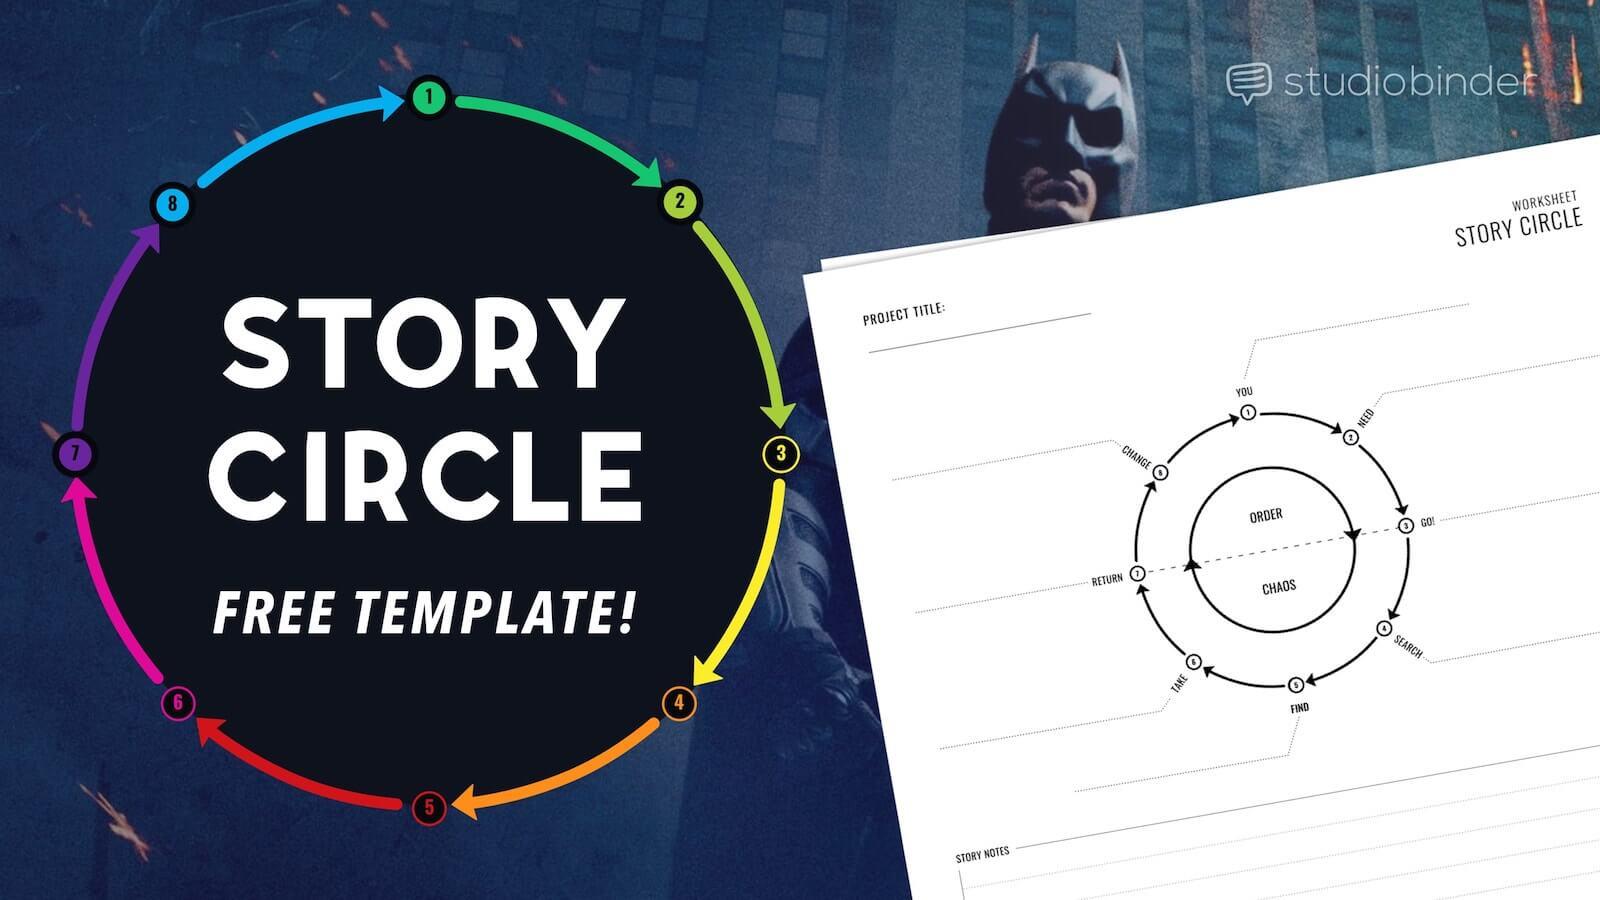 dan harmon story circle